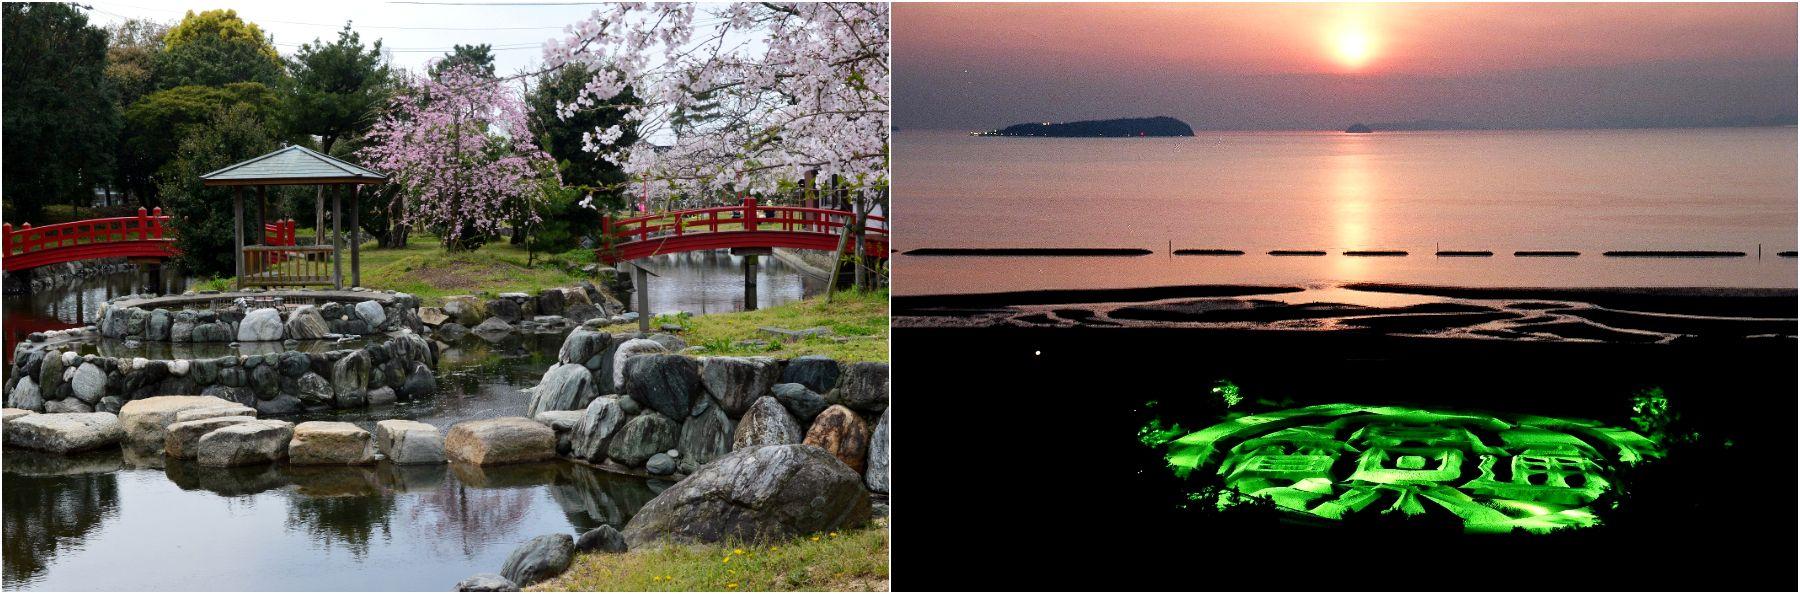 Kotohiki Park Zenigata Sunae (Kagawa prefecture)